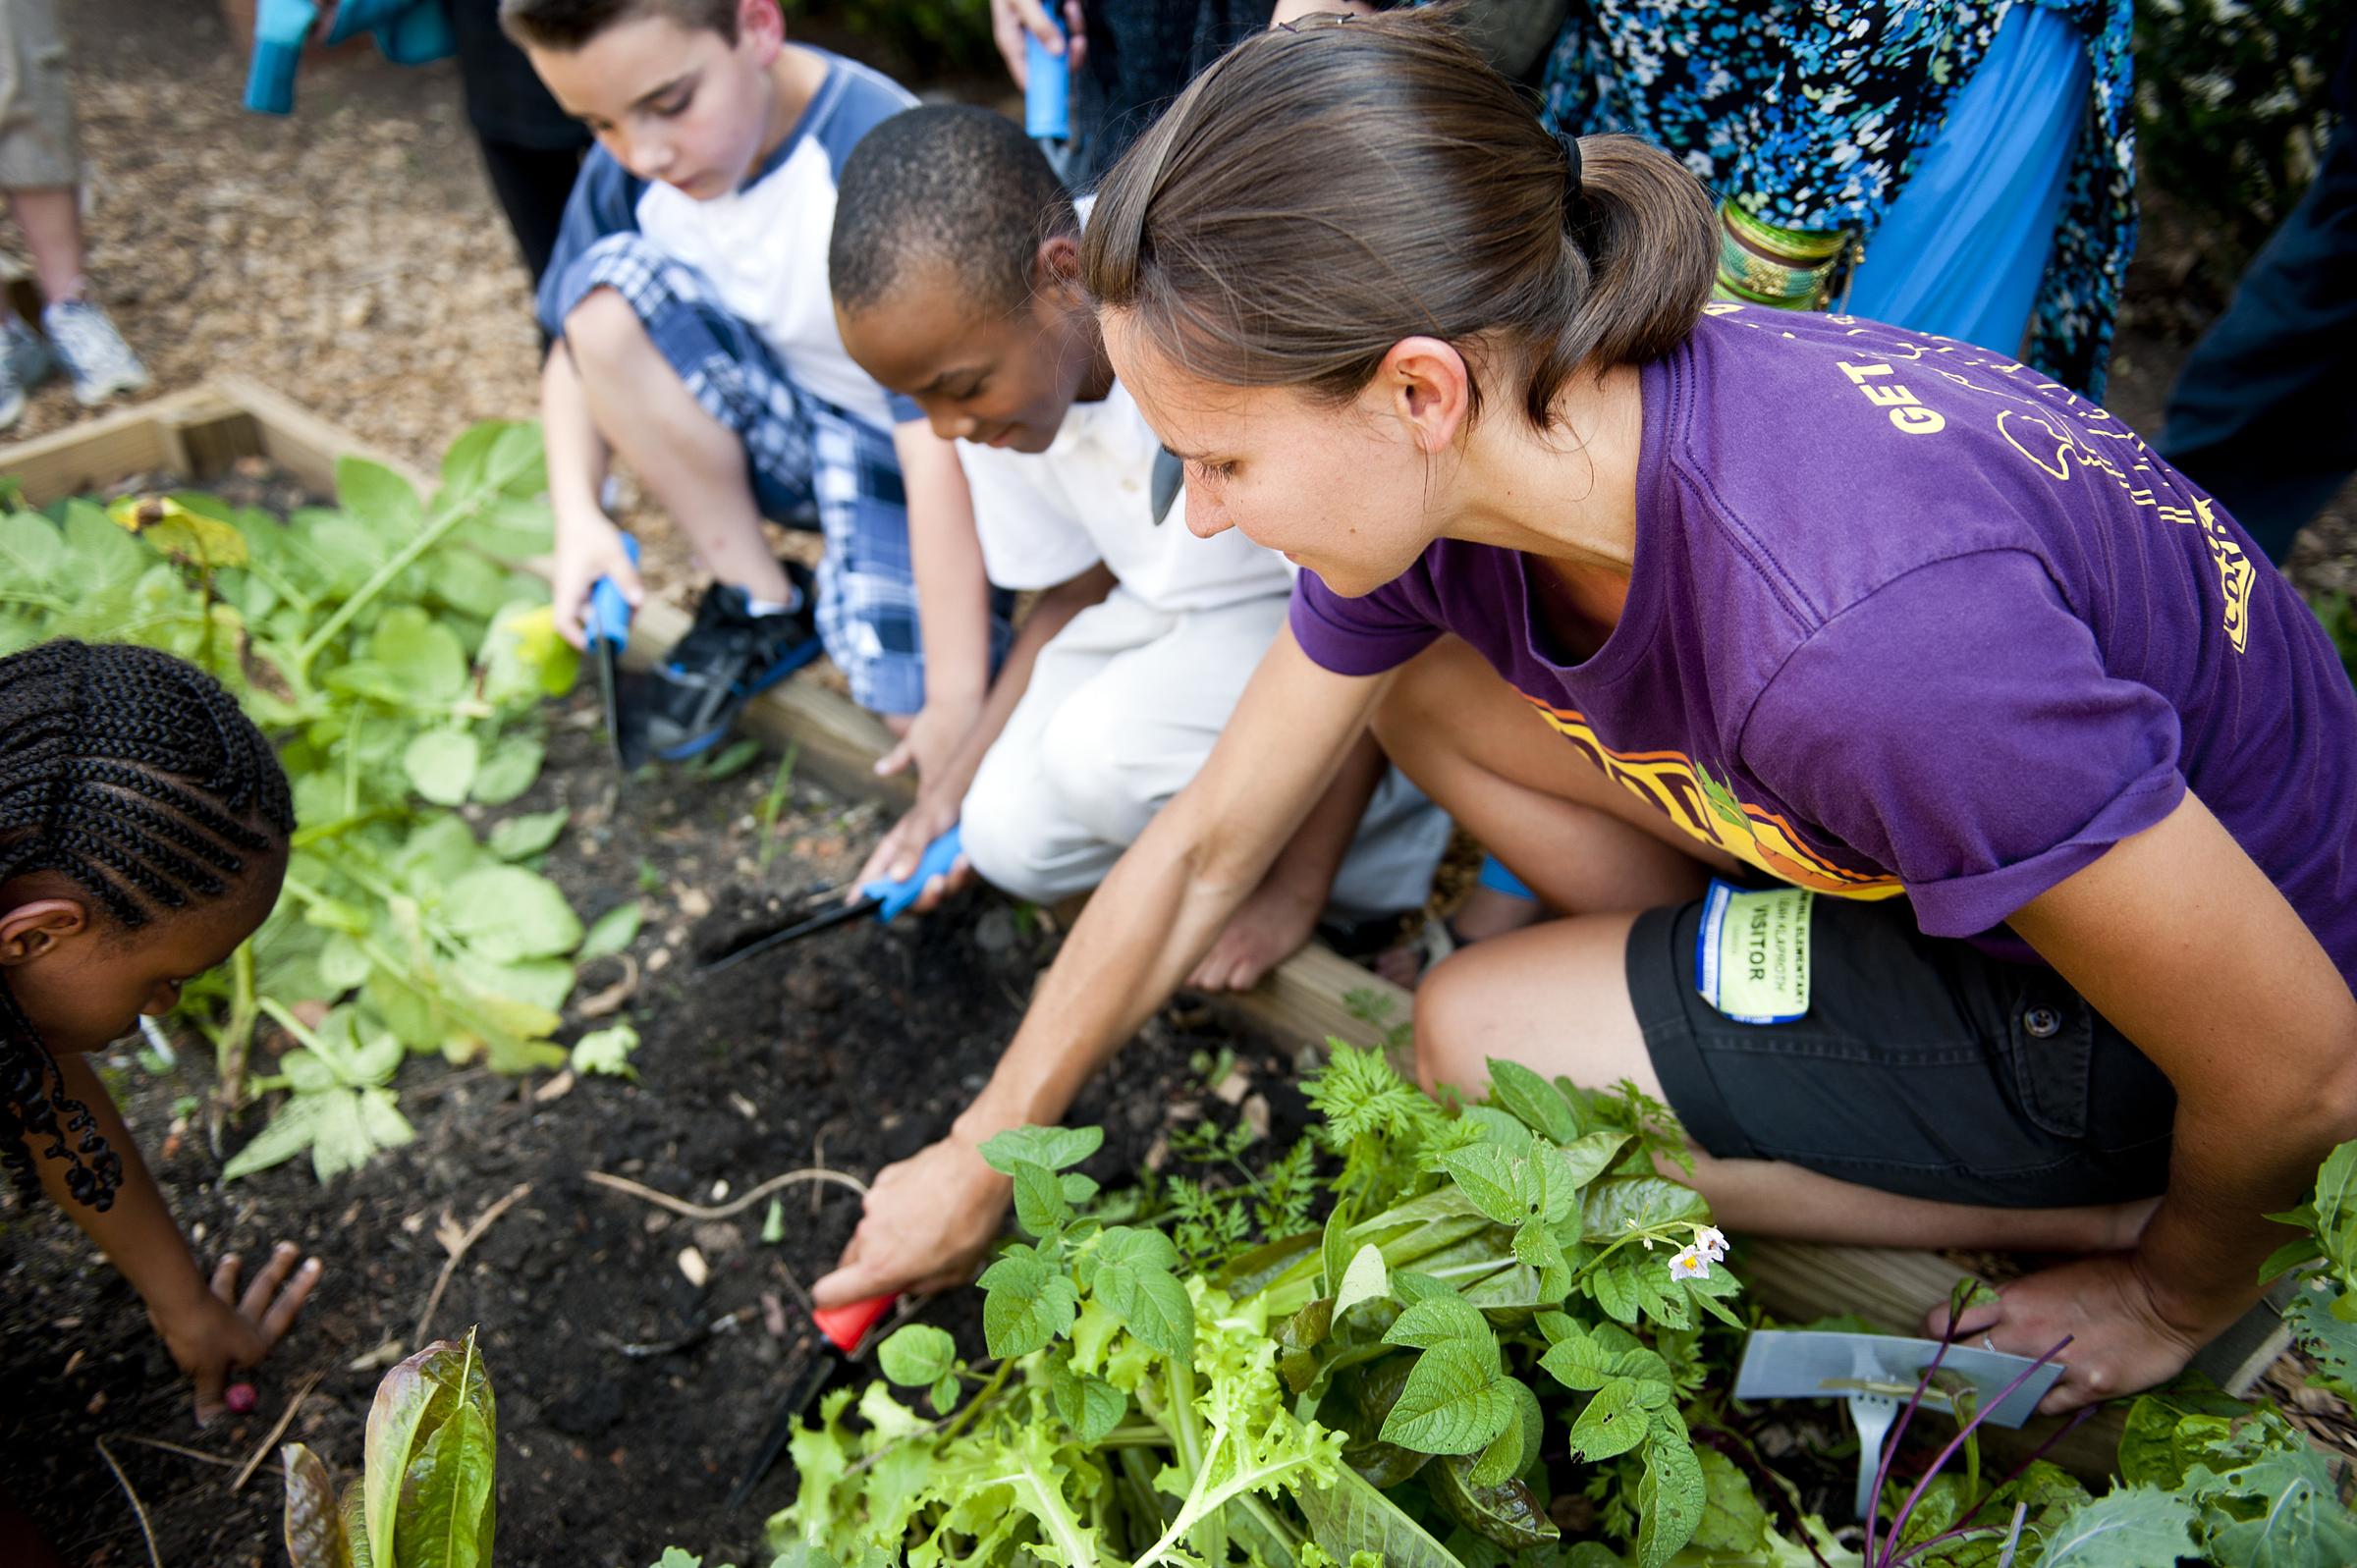 Volunteer with youth gardening program.